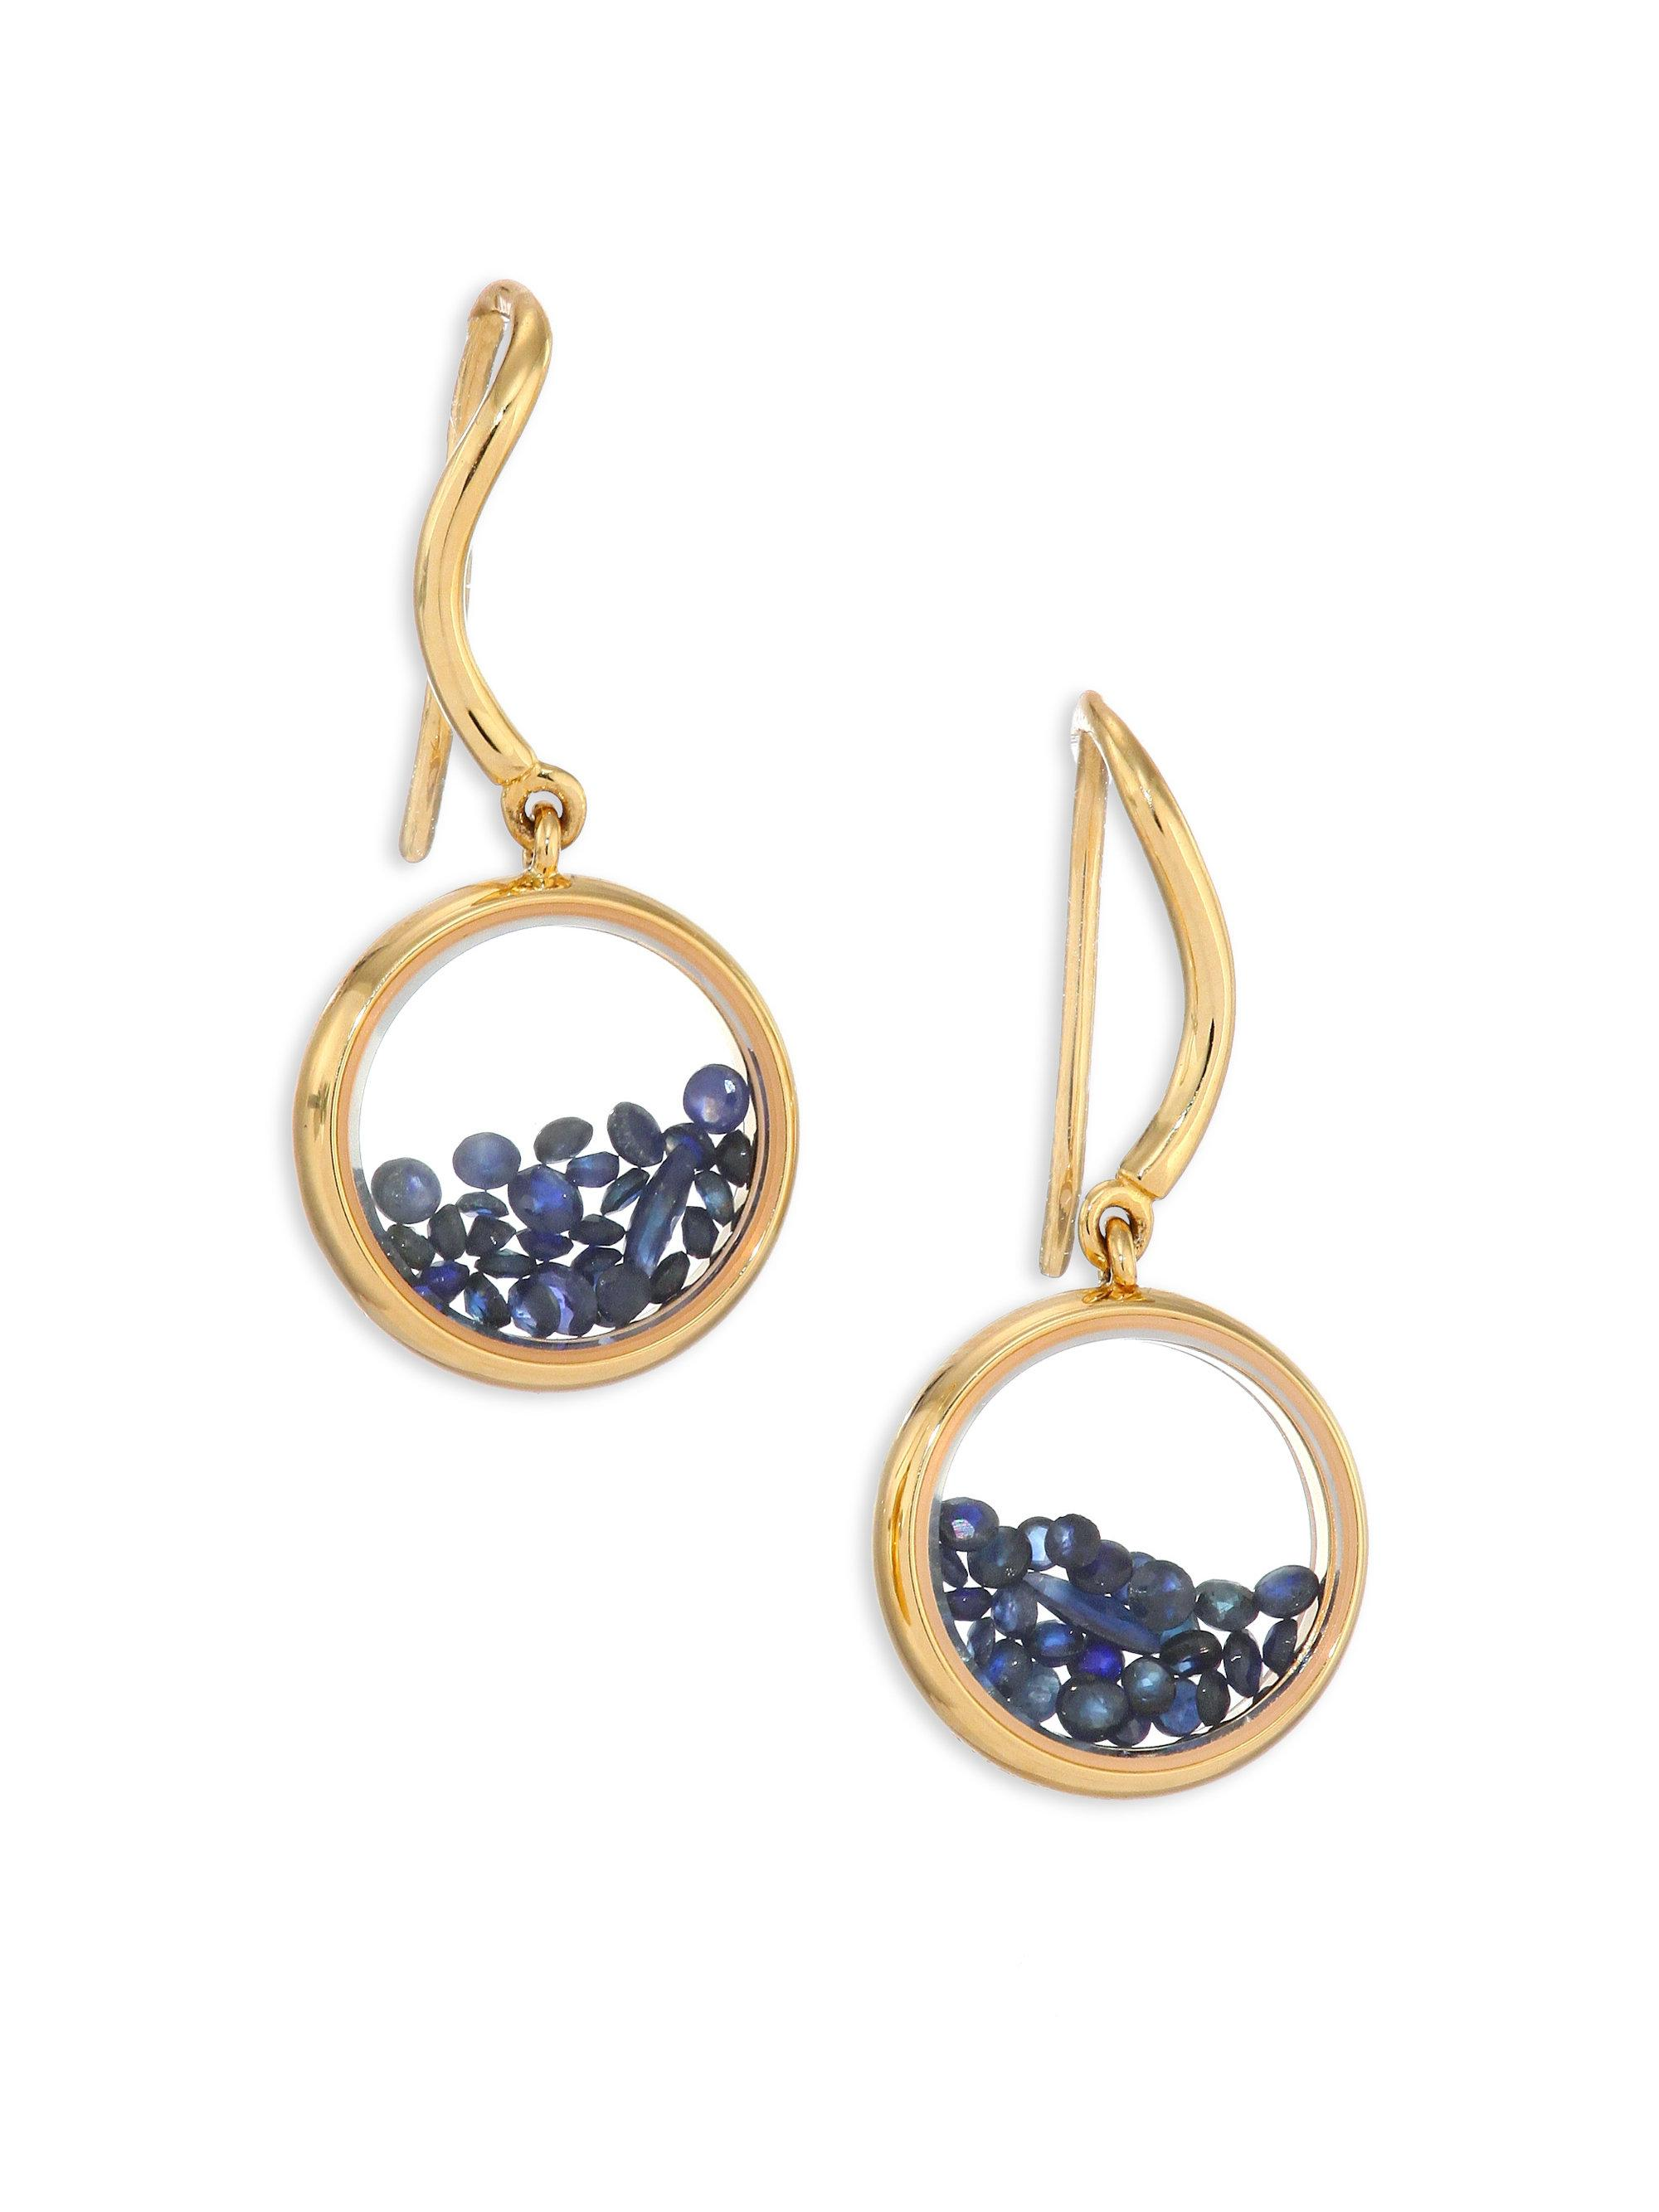 18kt gold & diamond drop earrings Aur O94xyI7